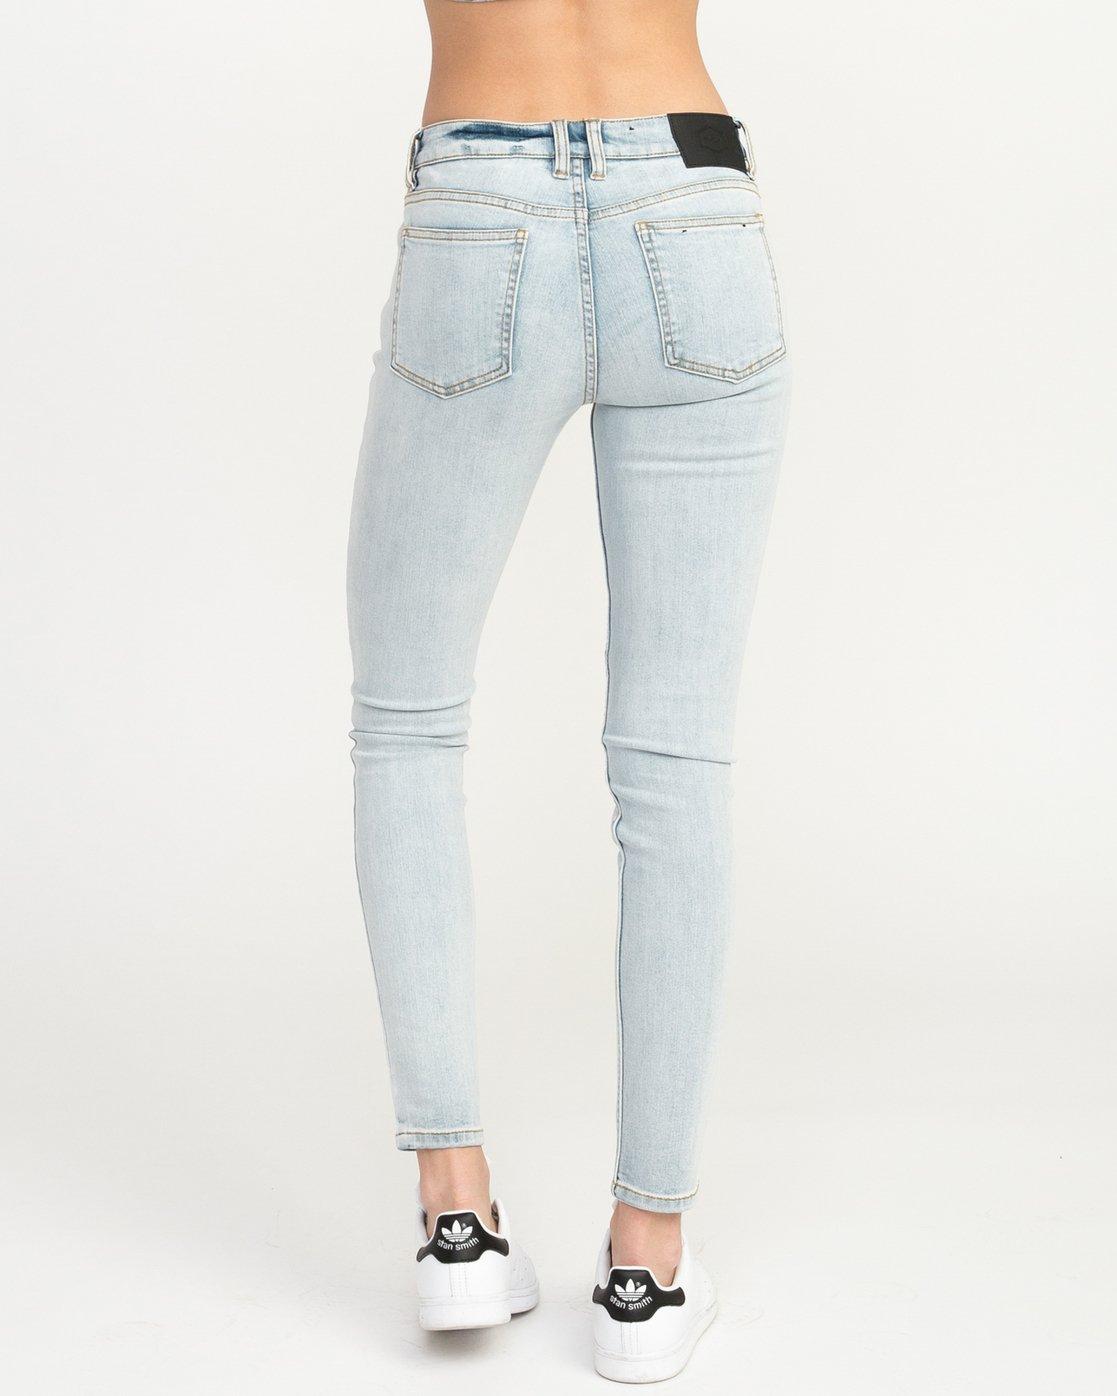 3 Dayley Mid Rise Denim Jeans White WCDP02DA RVCA